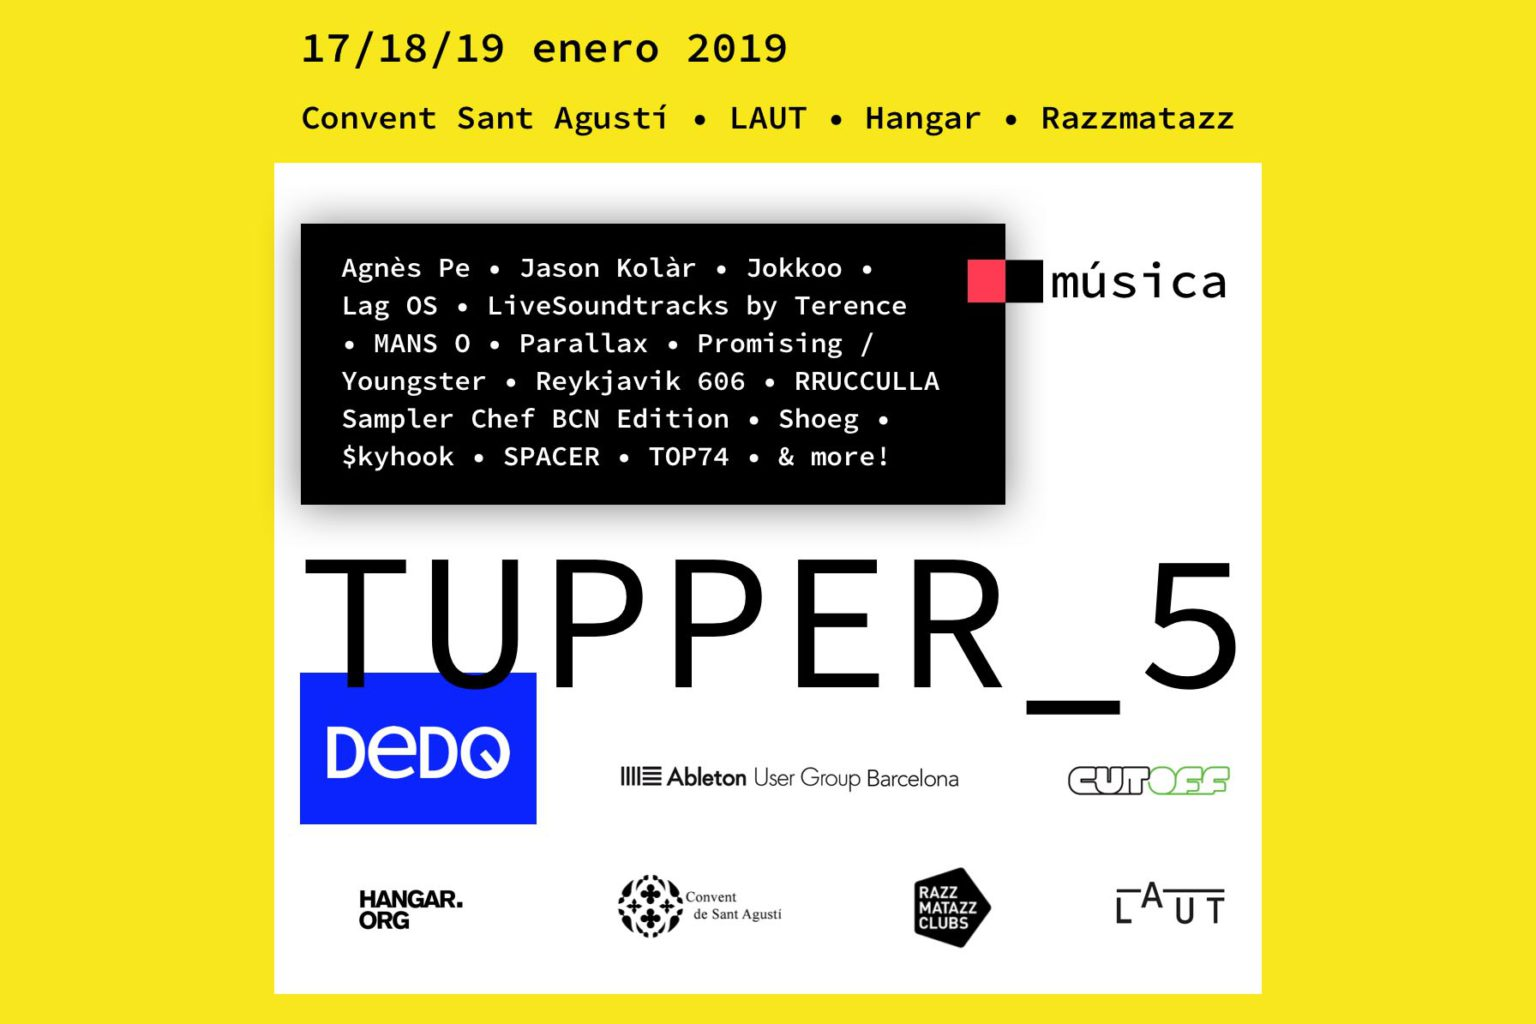 Tupper_5